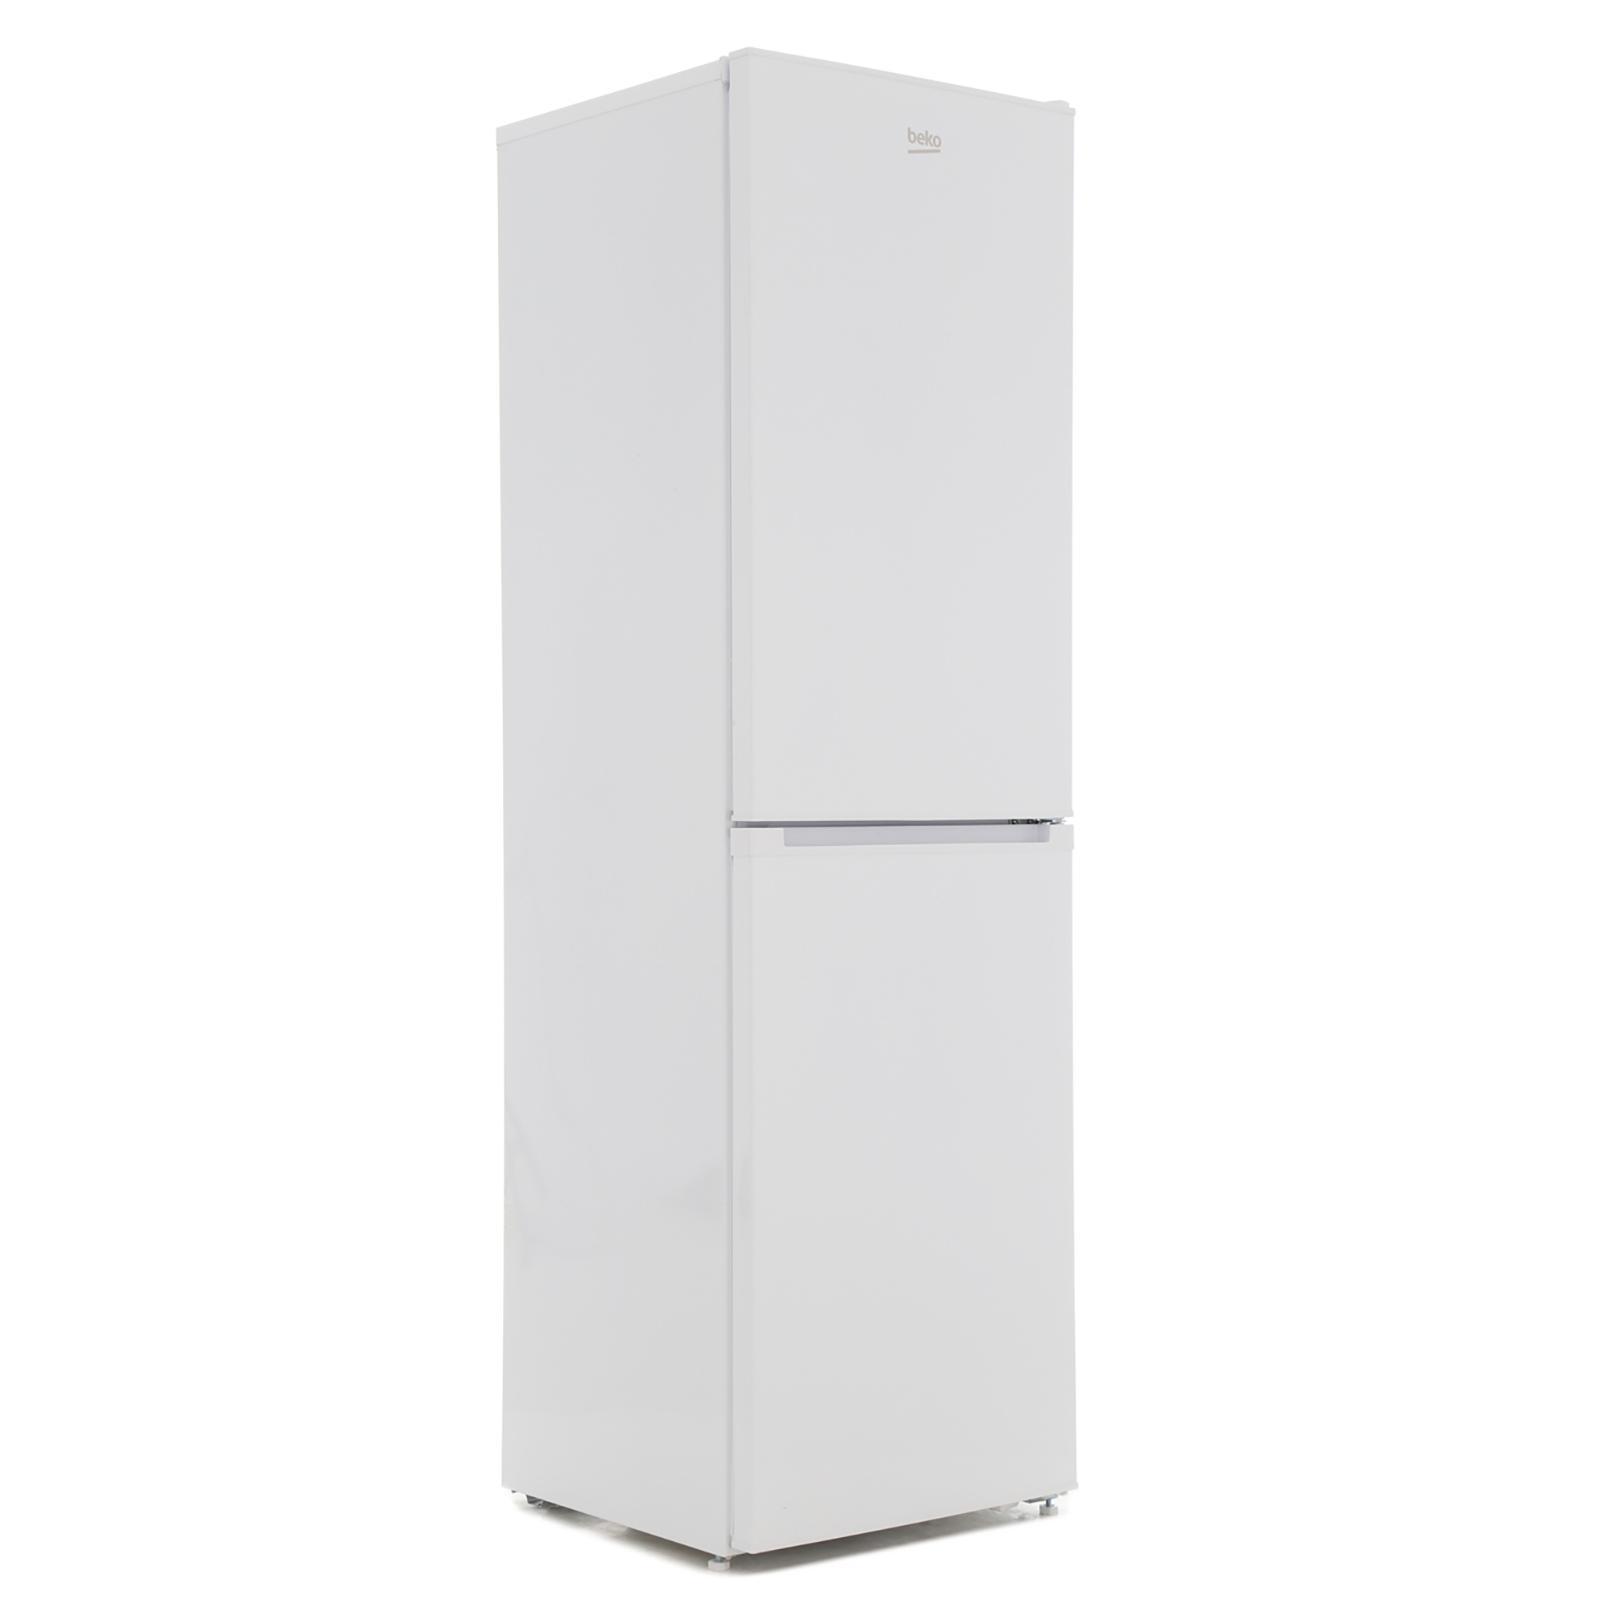 Beko CCFM1582W Frost Free Fridge Freezer